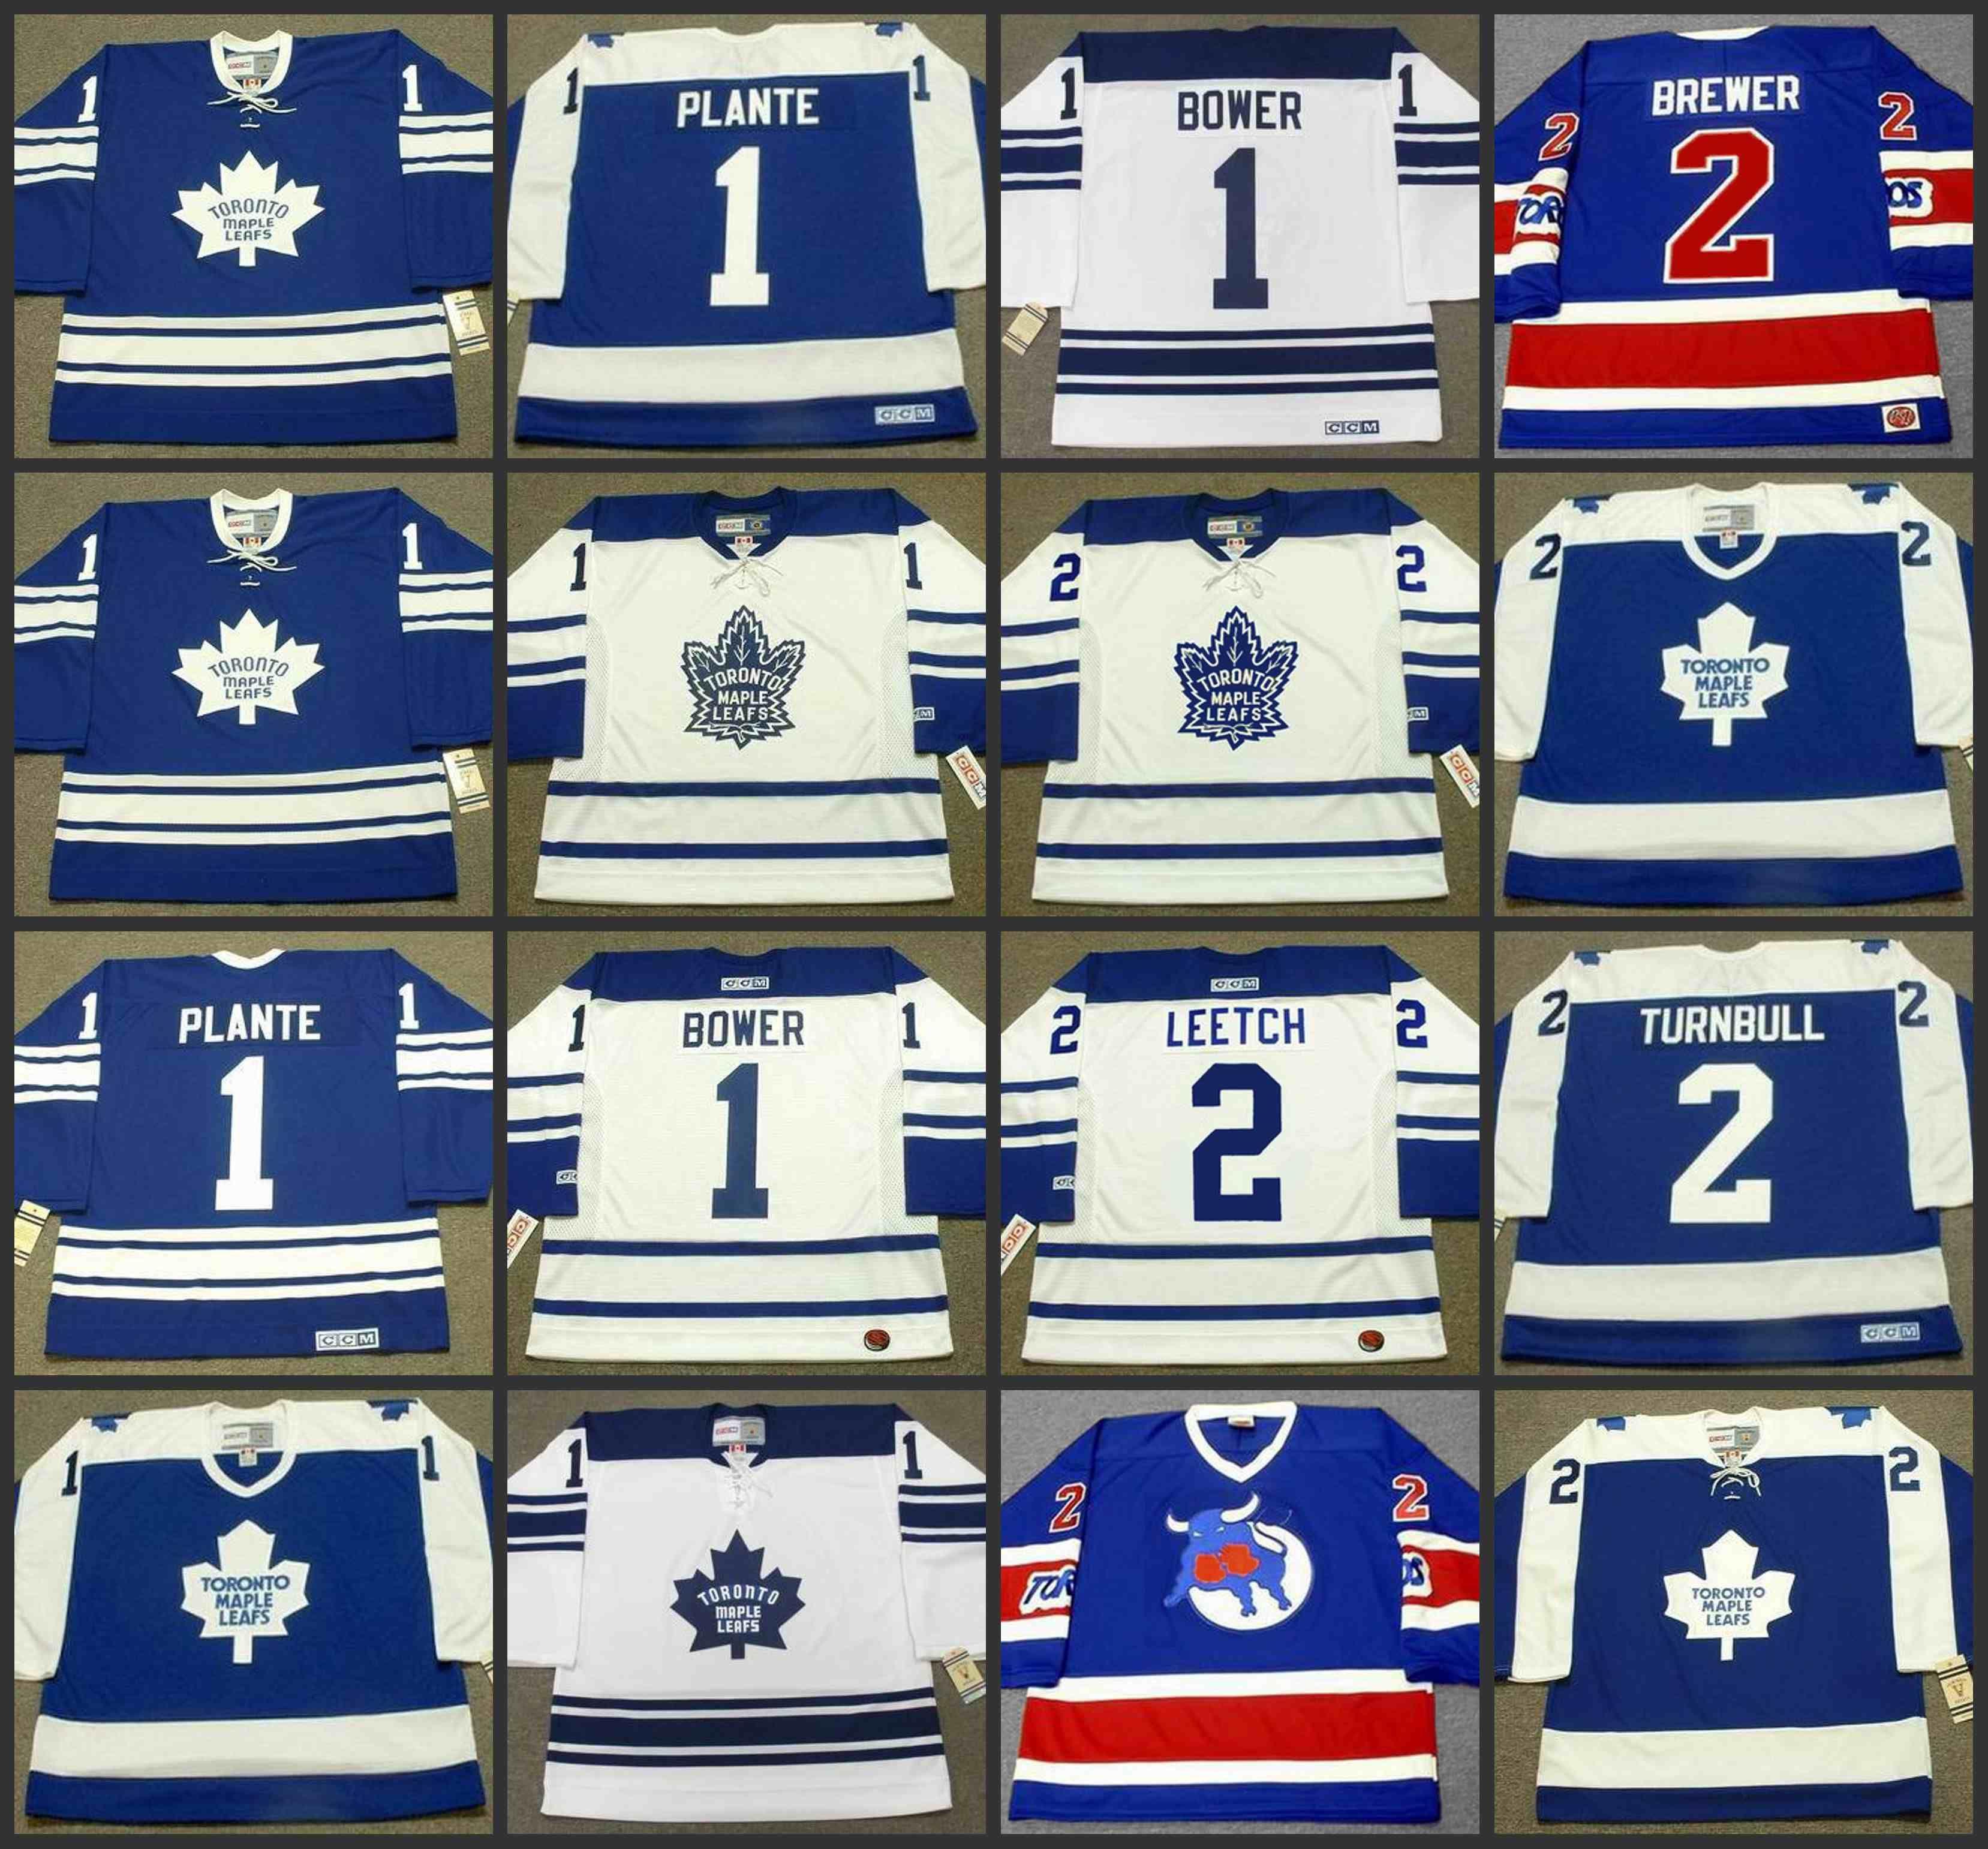 new style 7c225 a55c7 1 JACQUES PLANTE 1 JOHNNY BOWERT 2 BRIAN LEETCH 2 IAN TURNBULL toronto  Maple Leafs 1970 CCM Vintage NHL Hockey Jersey